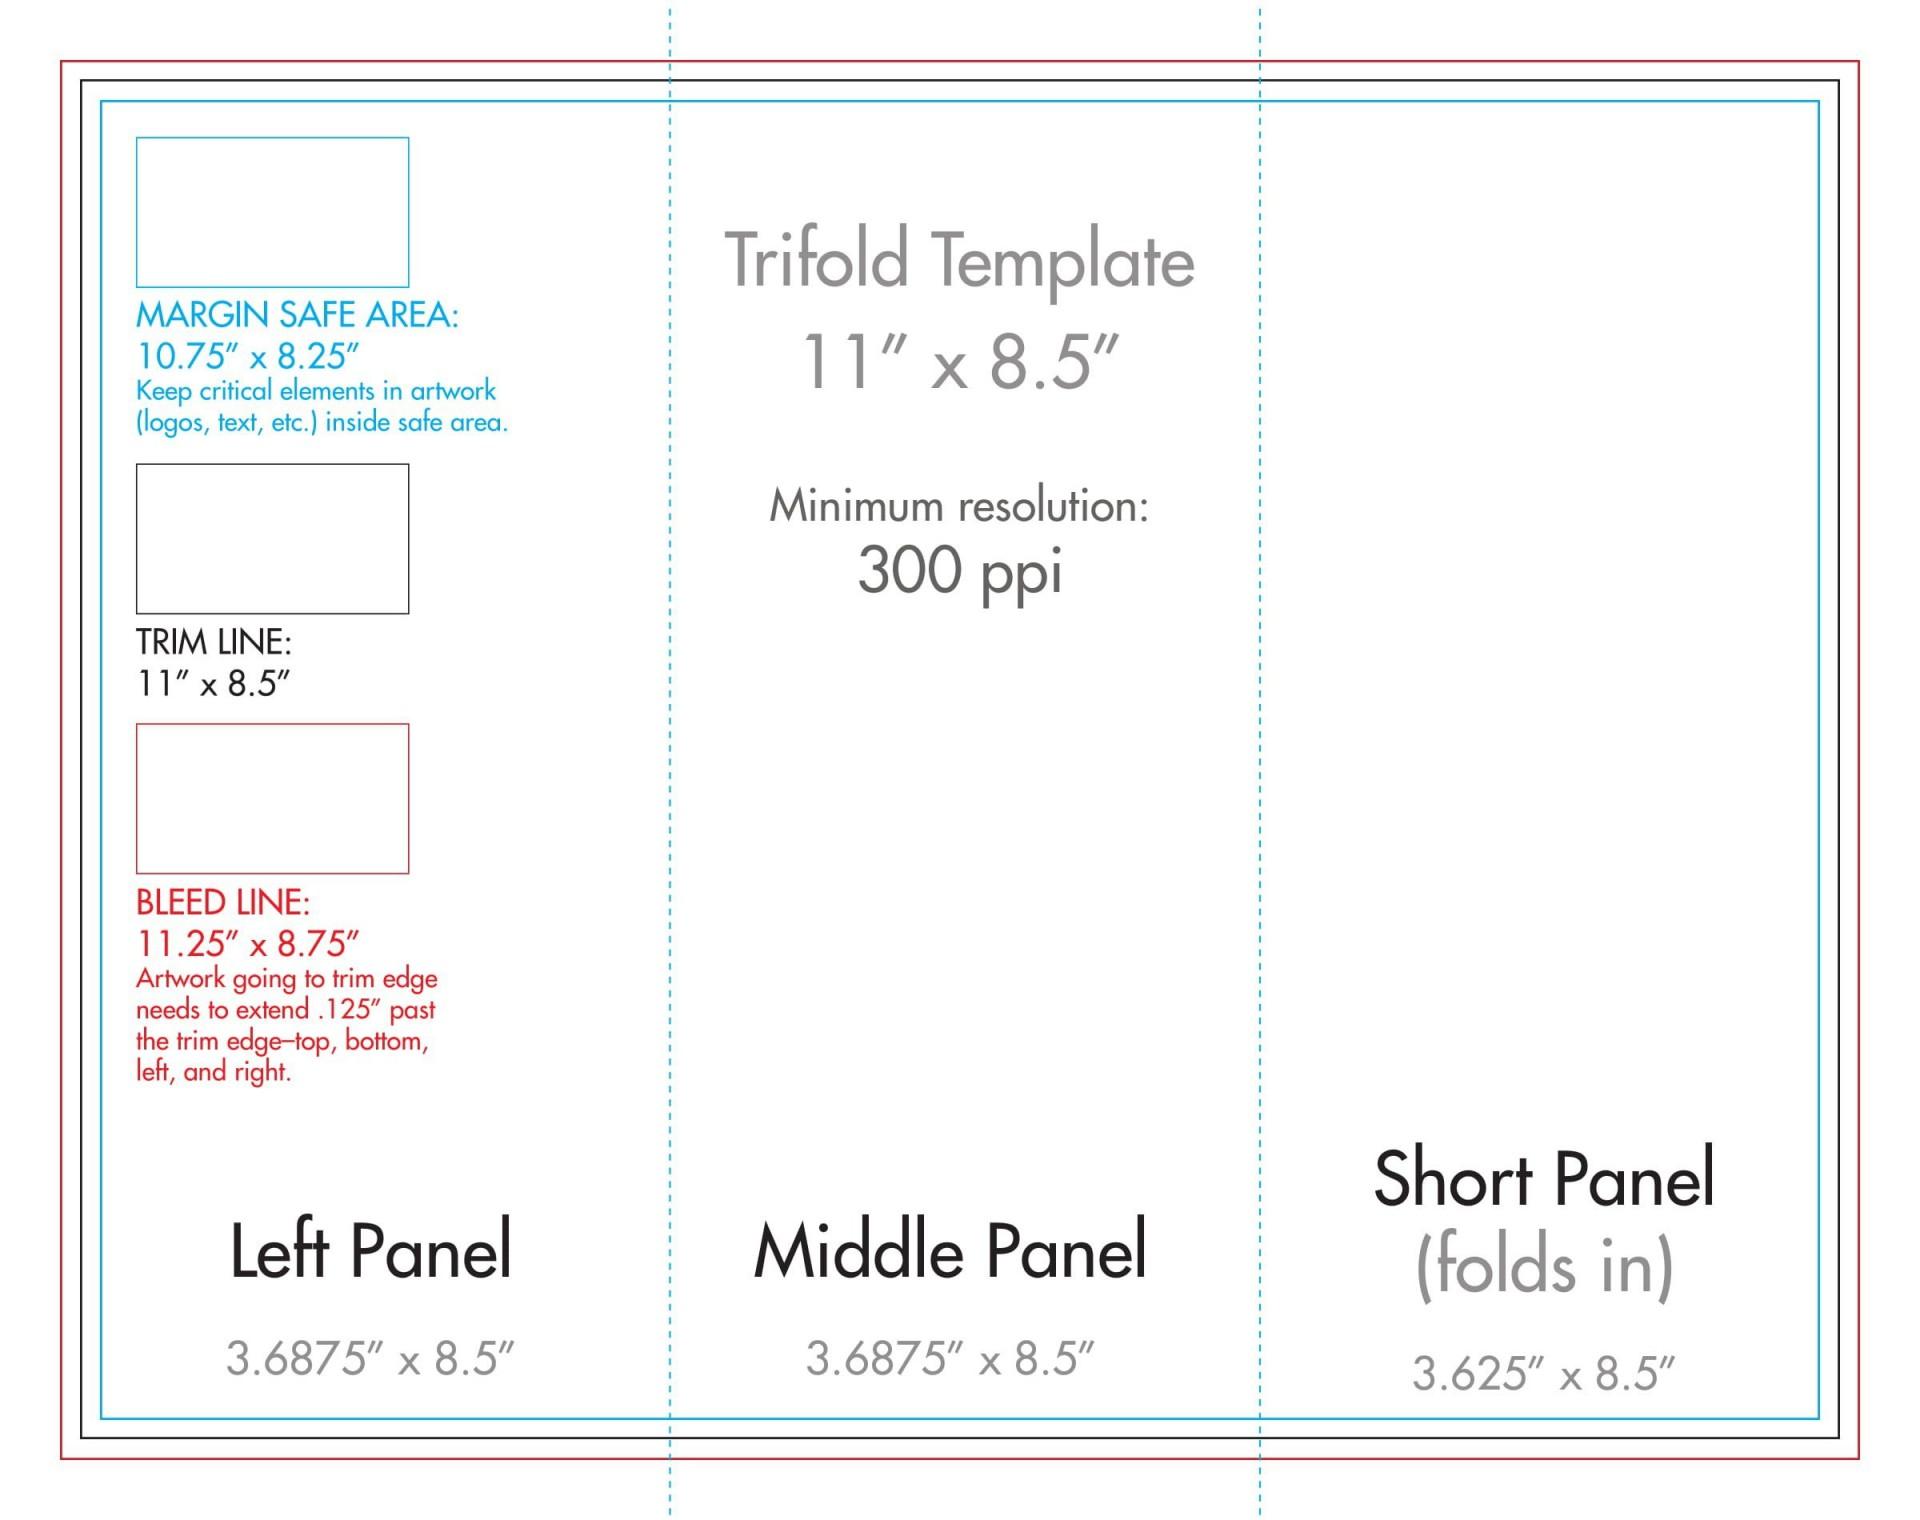 007 Wondrou 3 Fold Brochure Template Concept  Templates For Free1920